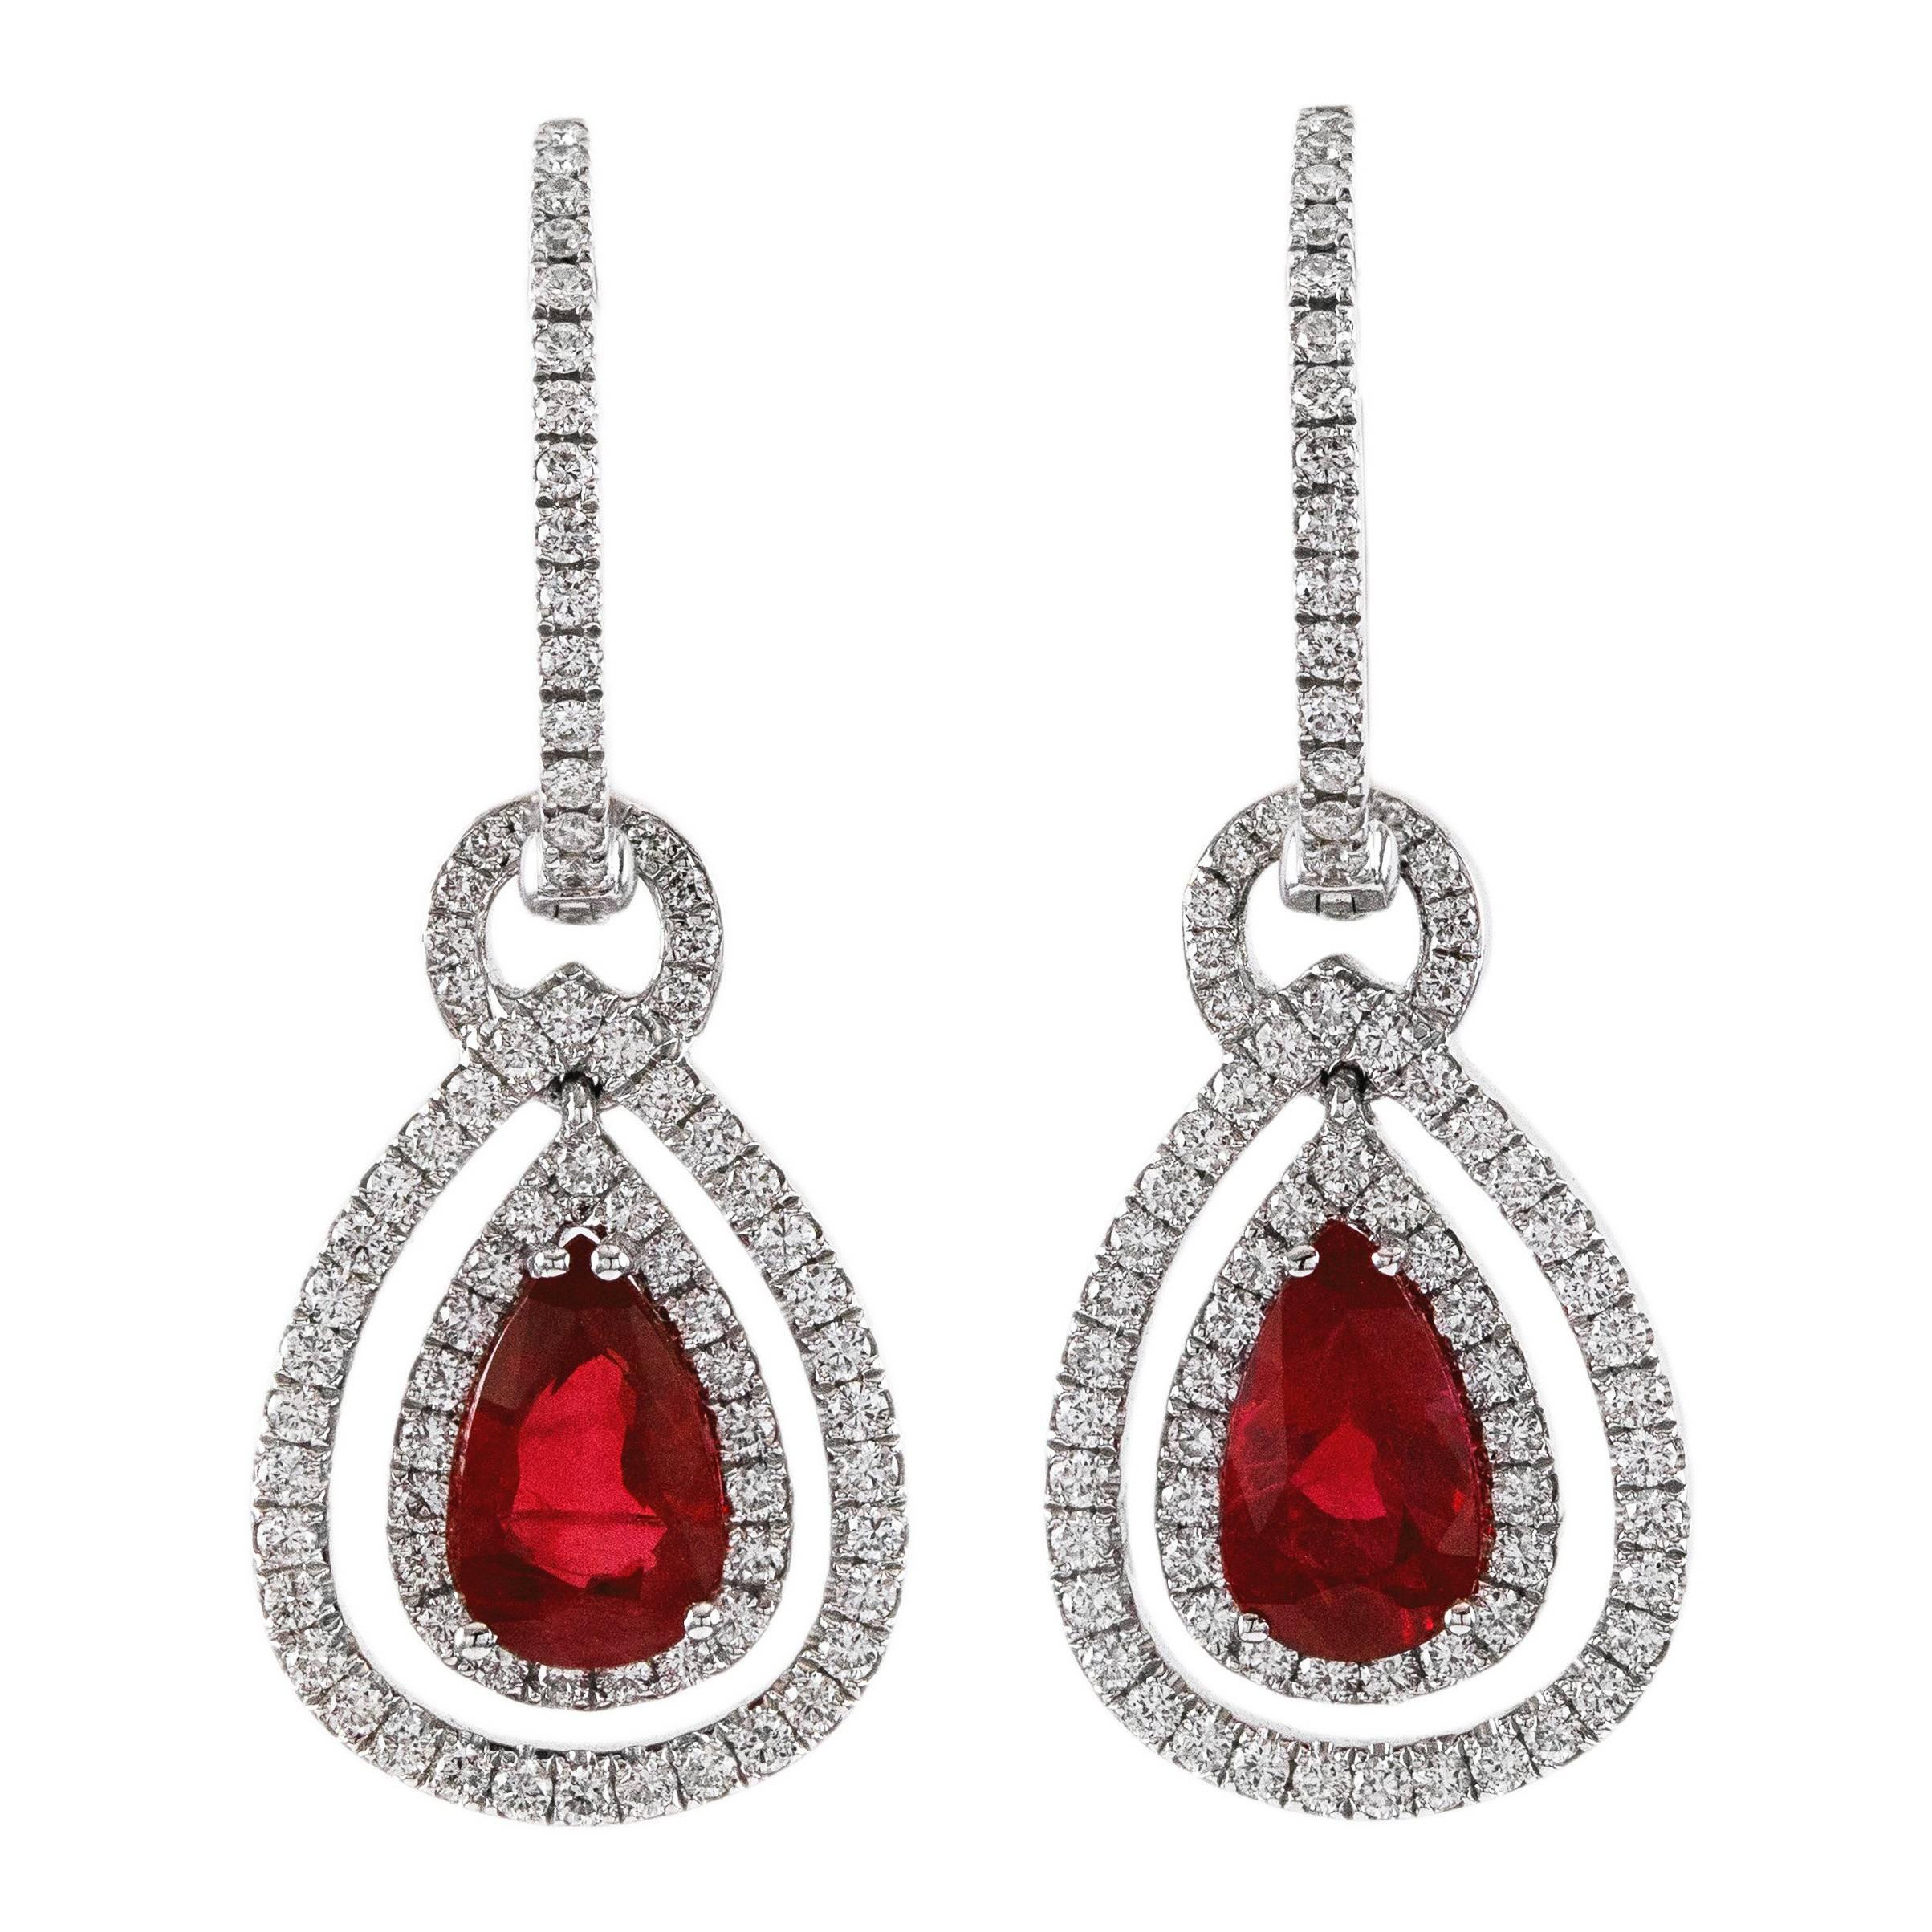 2.08 Carat Ruby Diamond Gold Dangling Earrings